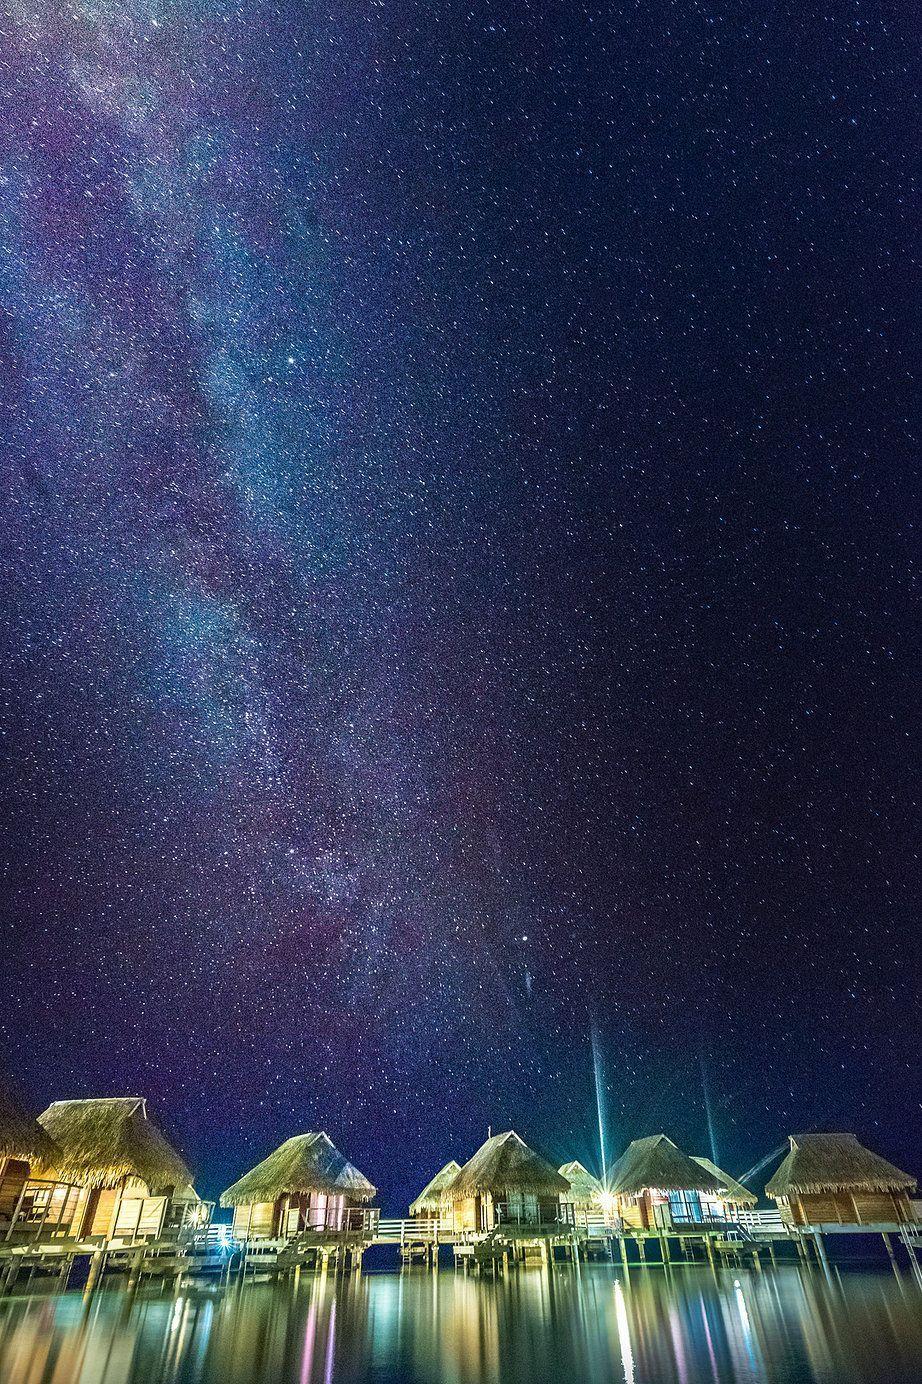 Brad Leyhelbert Landscape Night Photography Of A Beautiful Starry Sky Night Photography Art World Starry Night